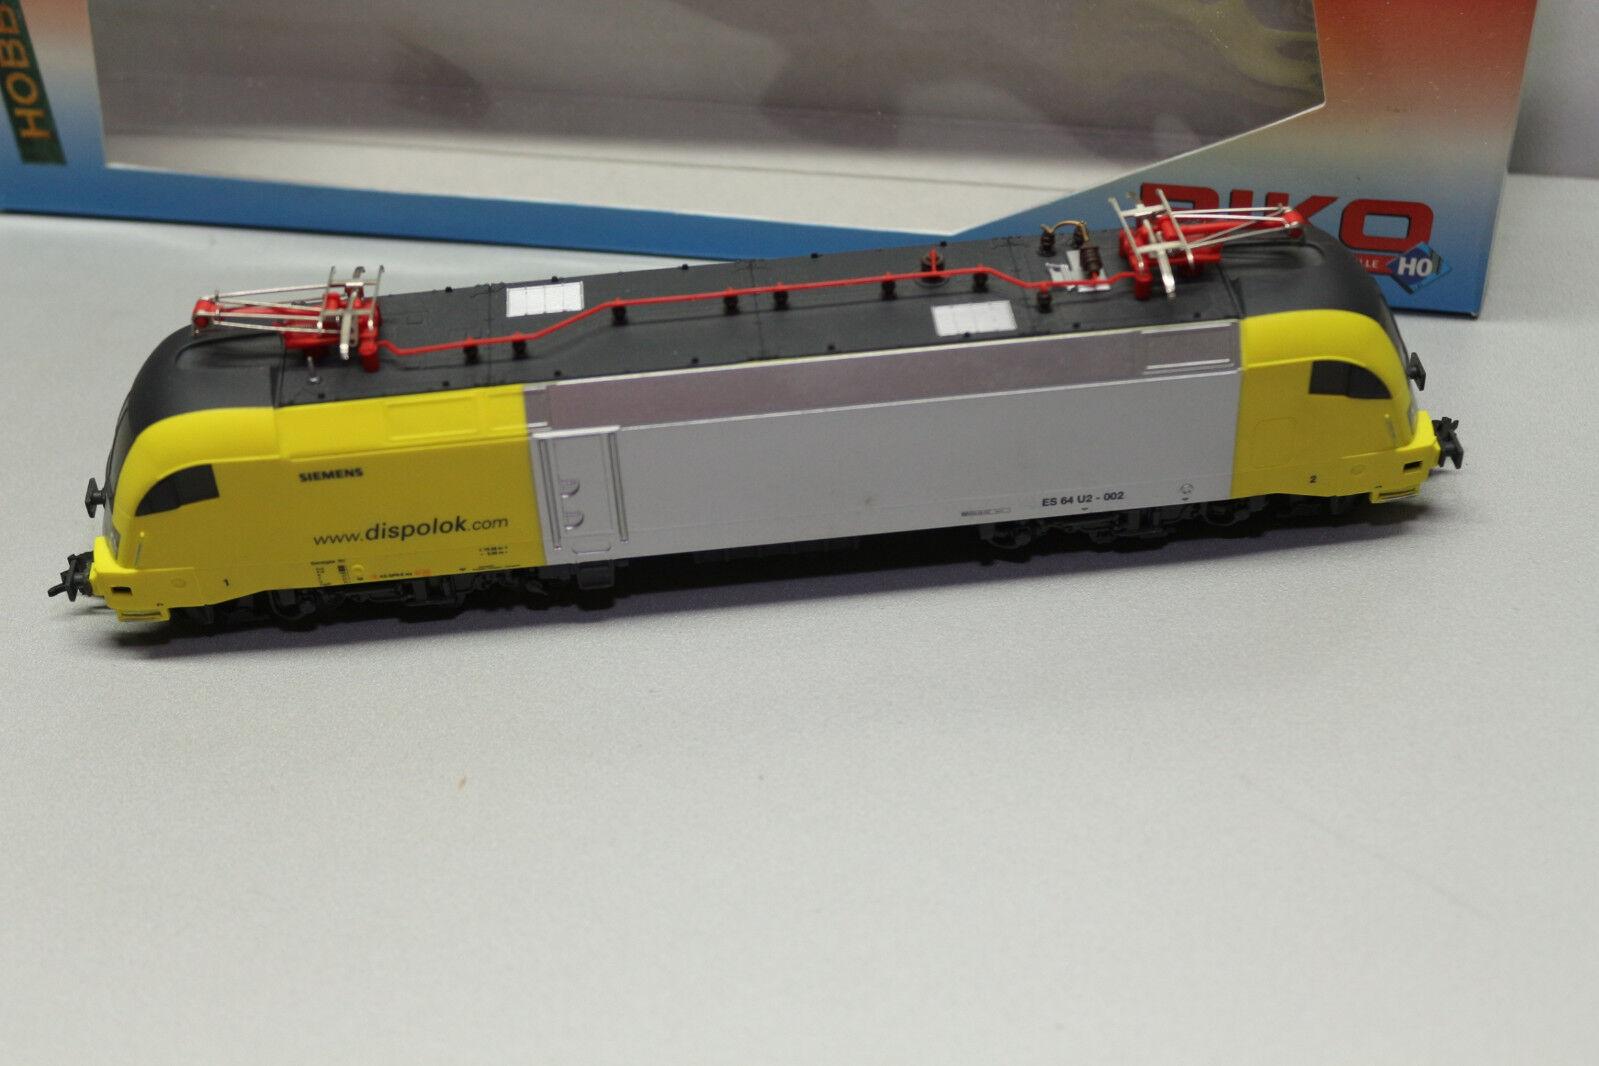 Piko 57411 57411 57411 DSS Elok Siemens Dispolok ES64 U2 Spur H0 OVP  M89    Smart  9dabd3